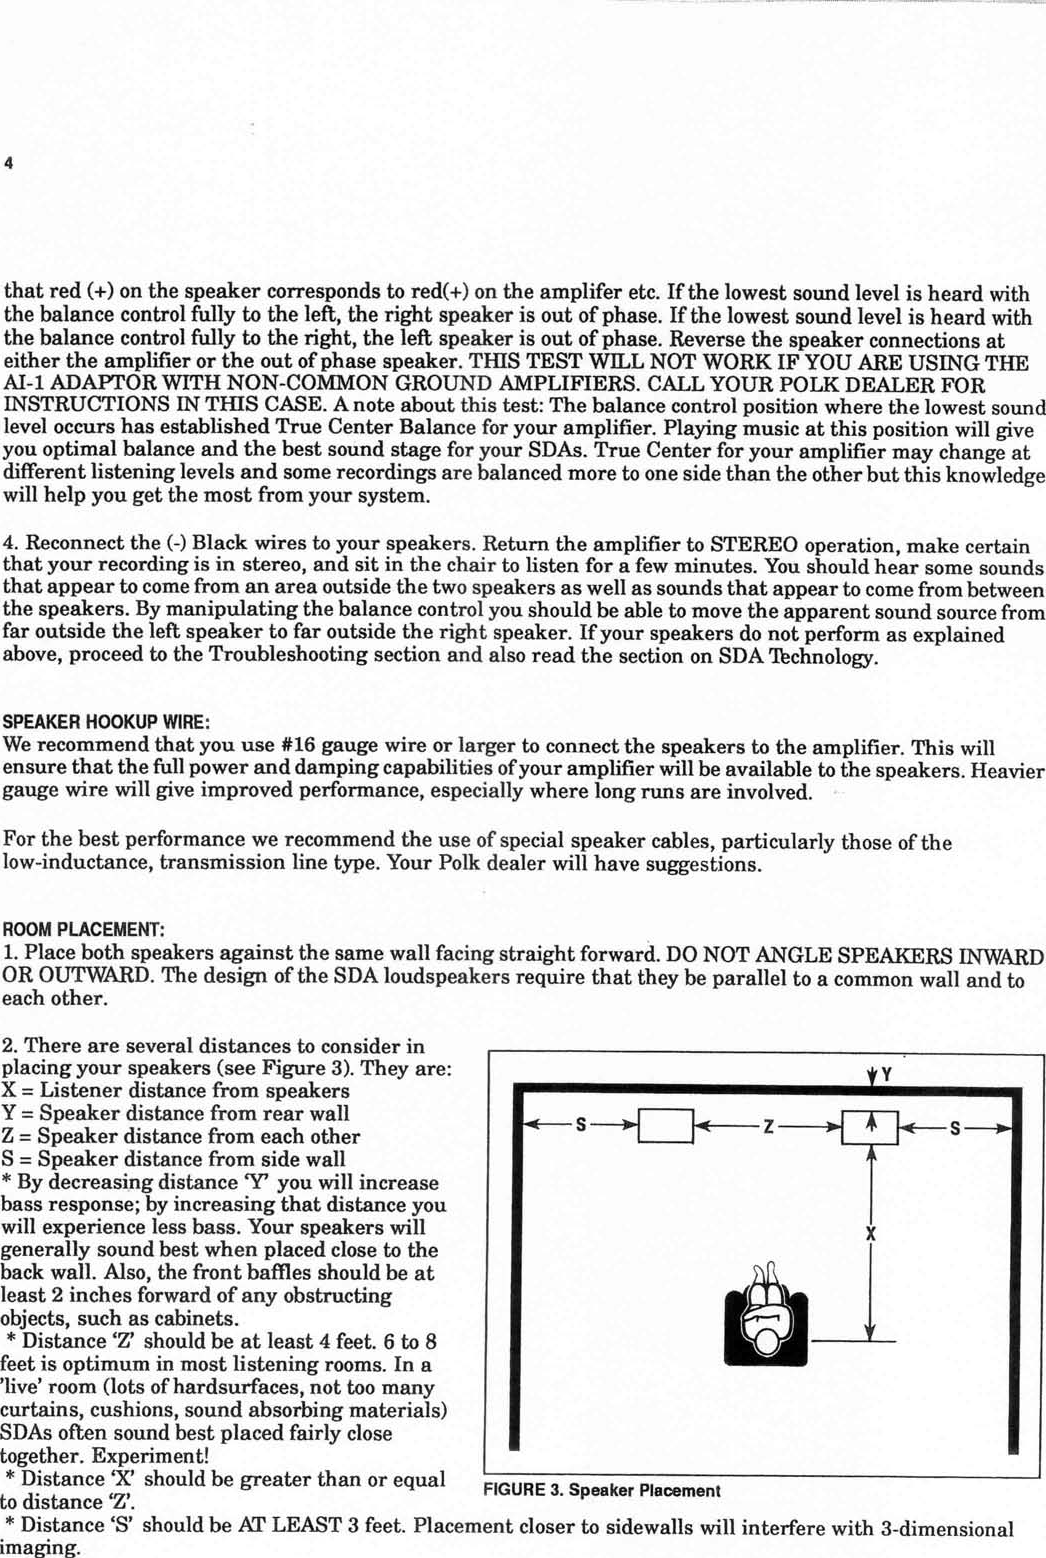 Polk Audio Loudspeakers Sda Users Manual